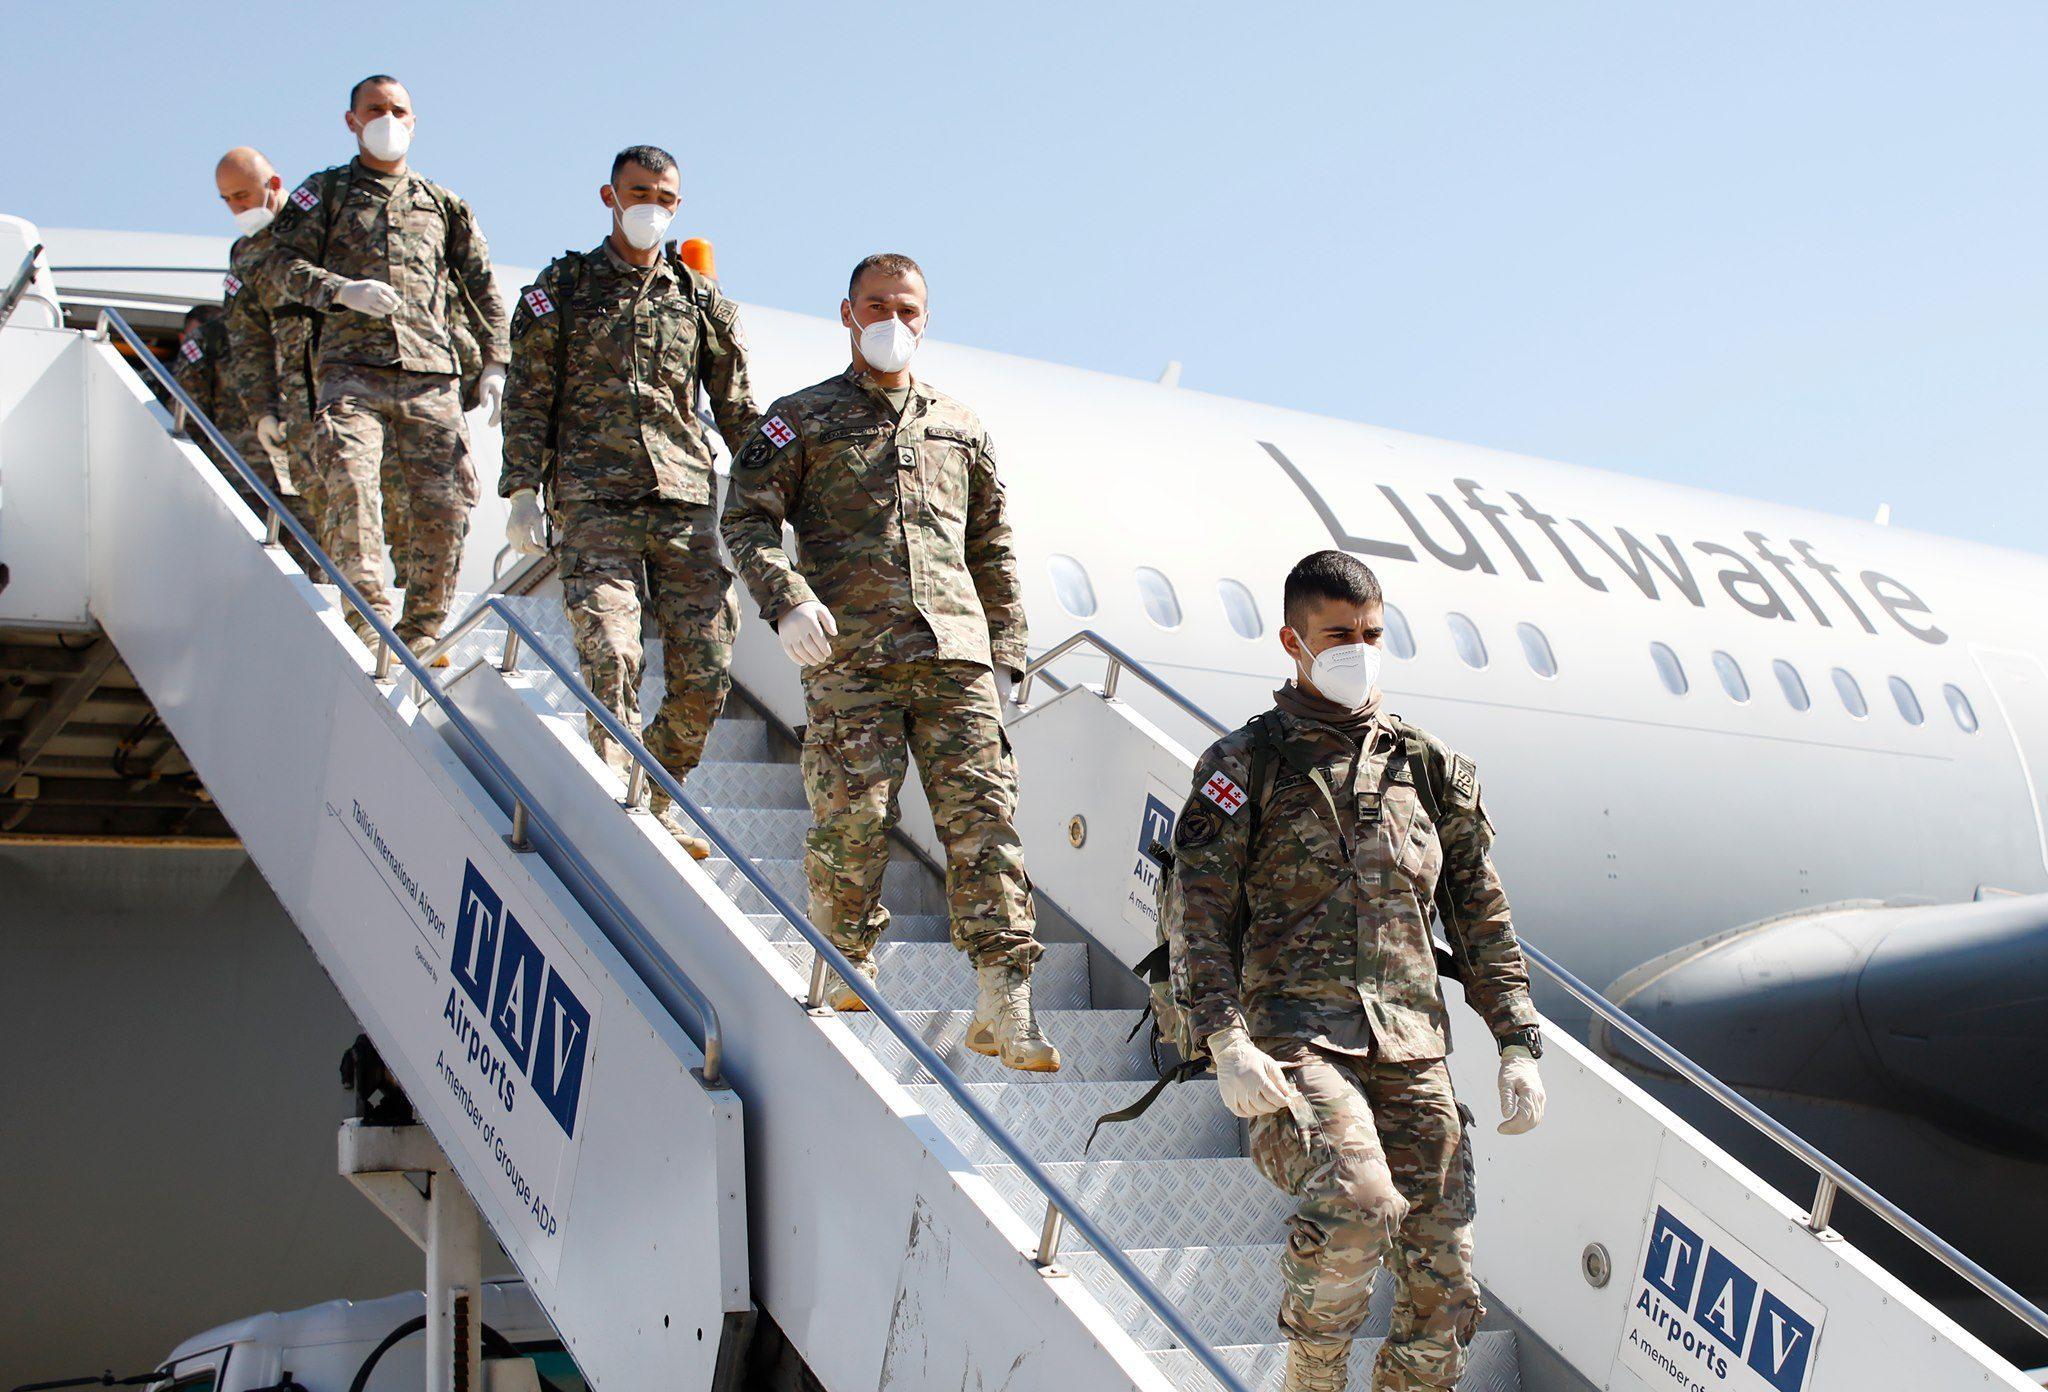 188587579 4402566429776065 6242517173997945511 n e1621602103505 #новости Афганистан, Грузия-Германия, миссия в Афганистане, Хуберт Книрш